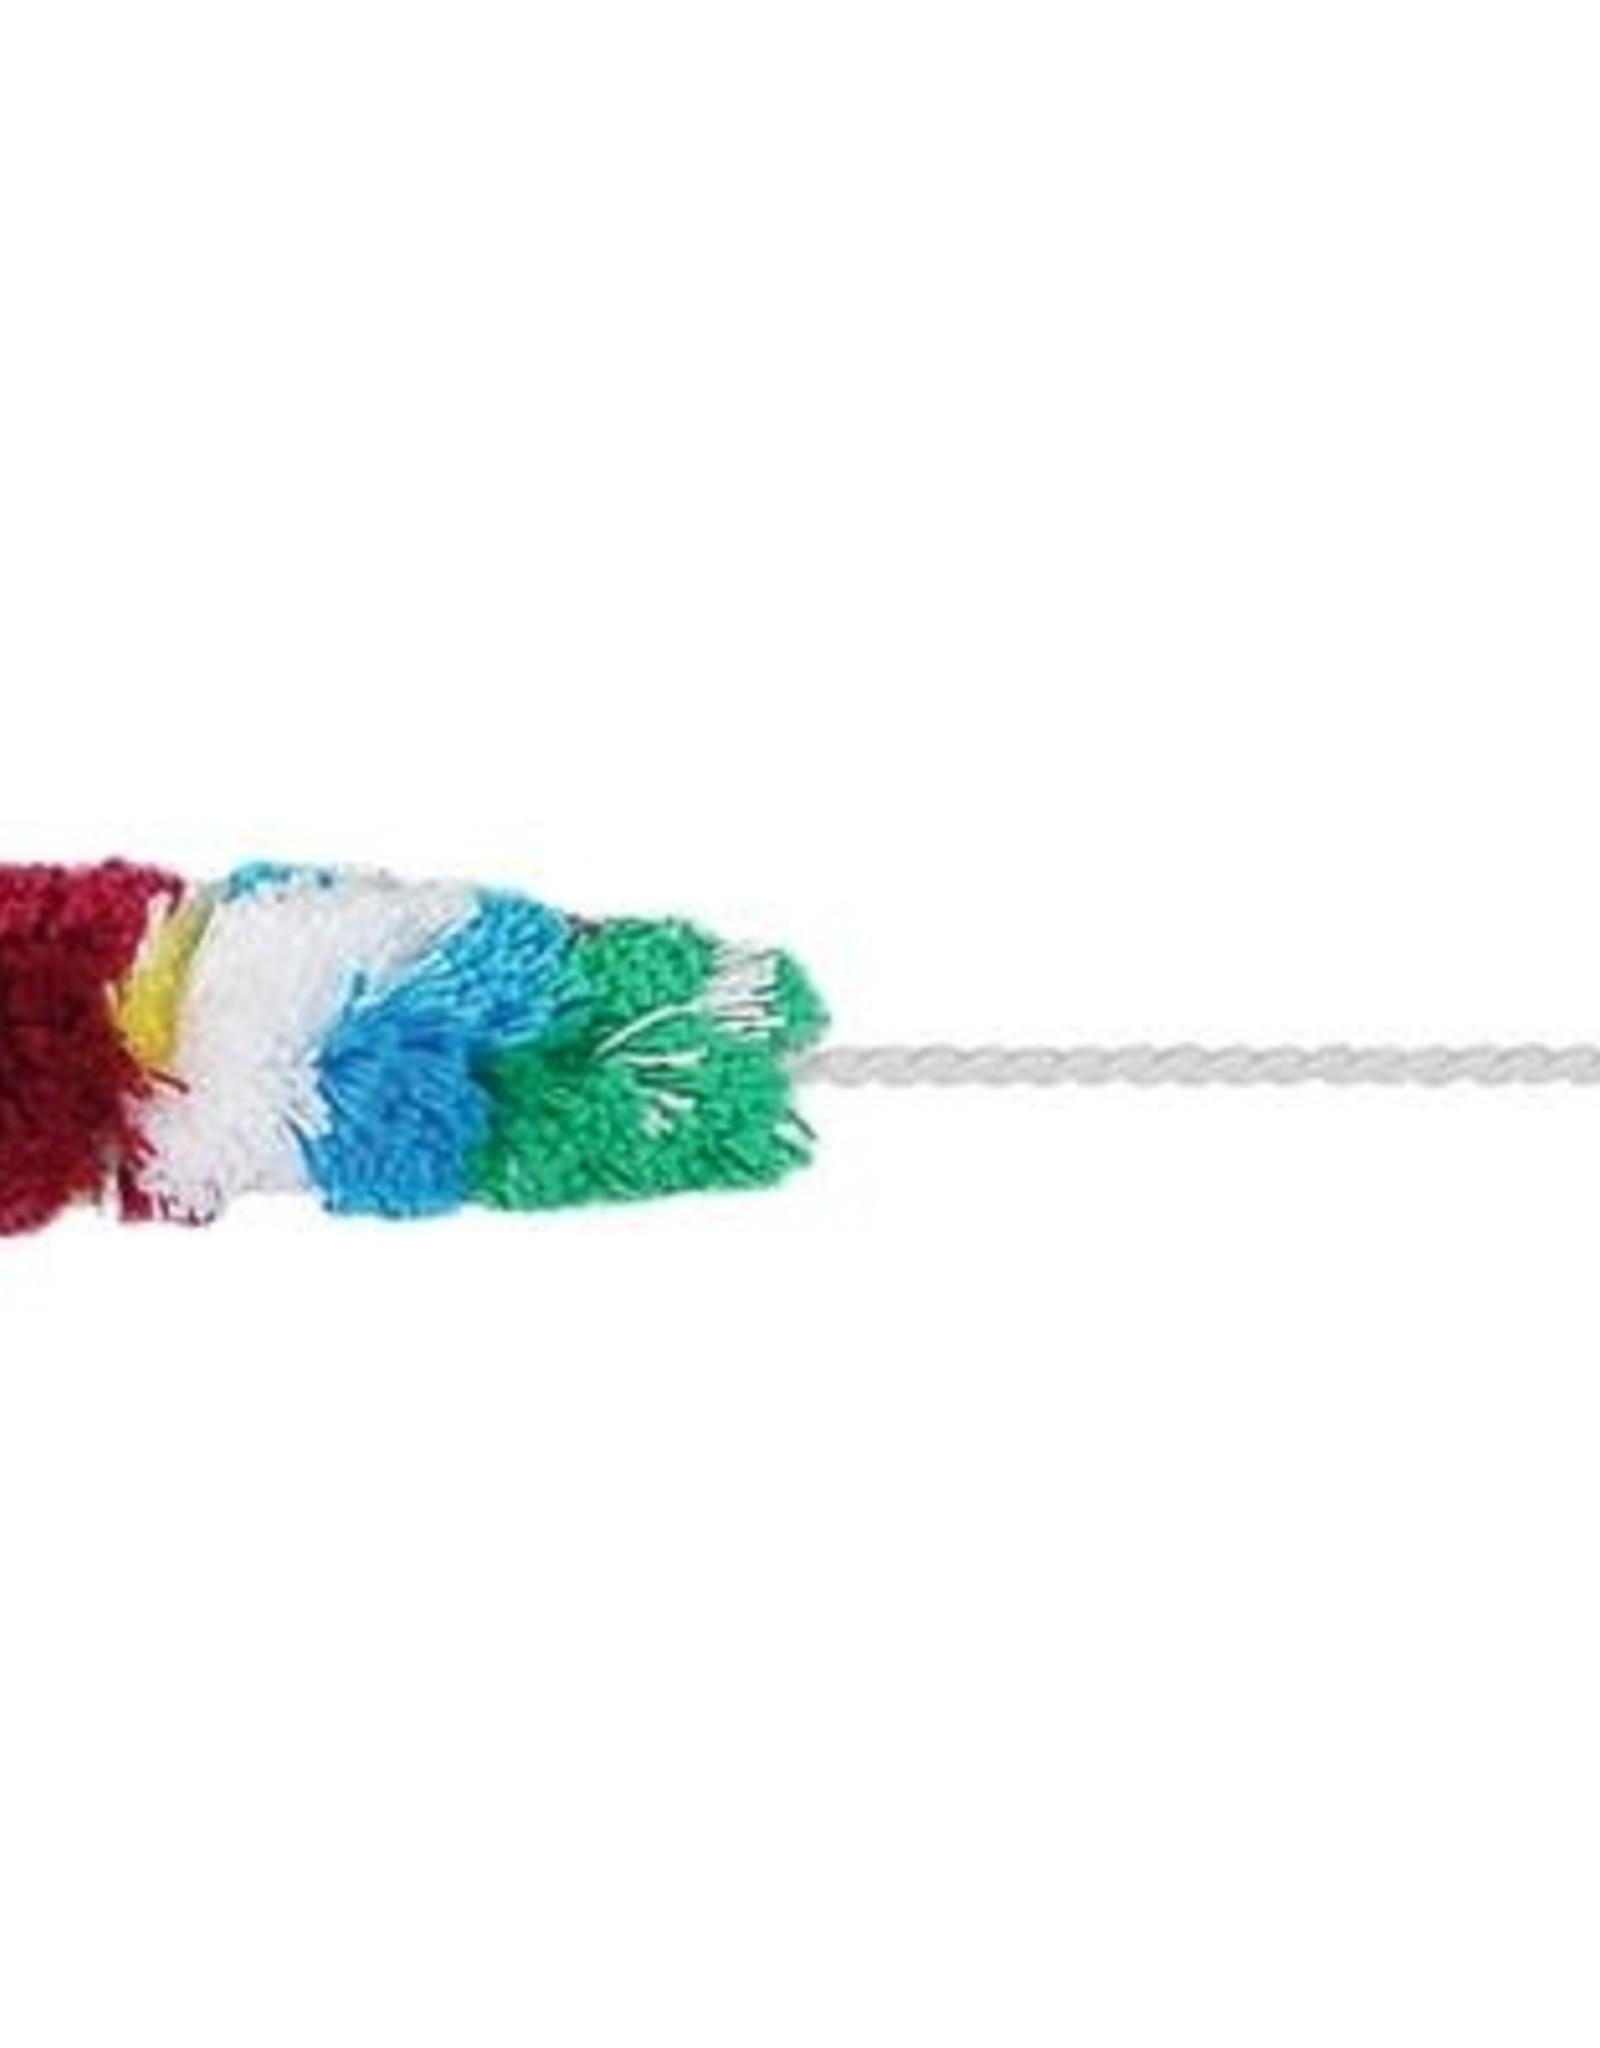 Alto recorder swab, 10 cm. micro-fiber swab with coated wire handle - art. HL-1450